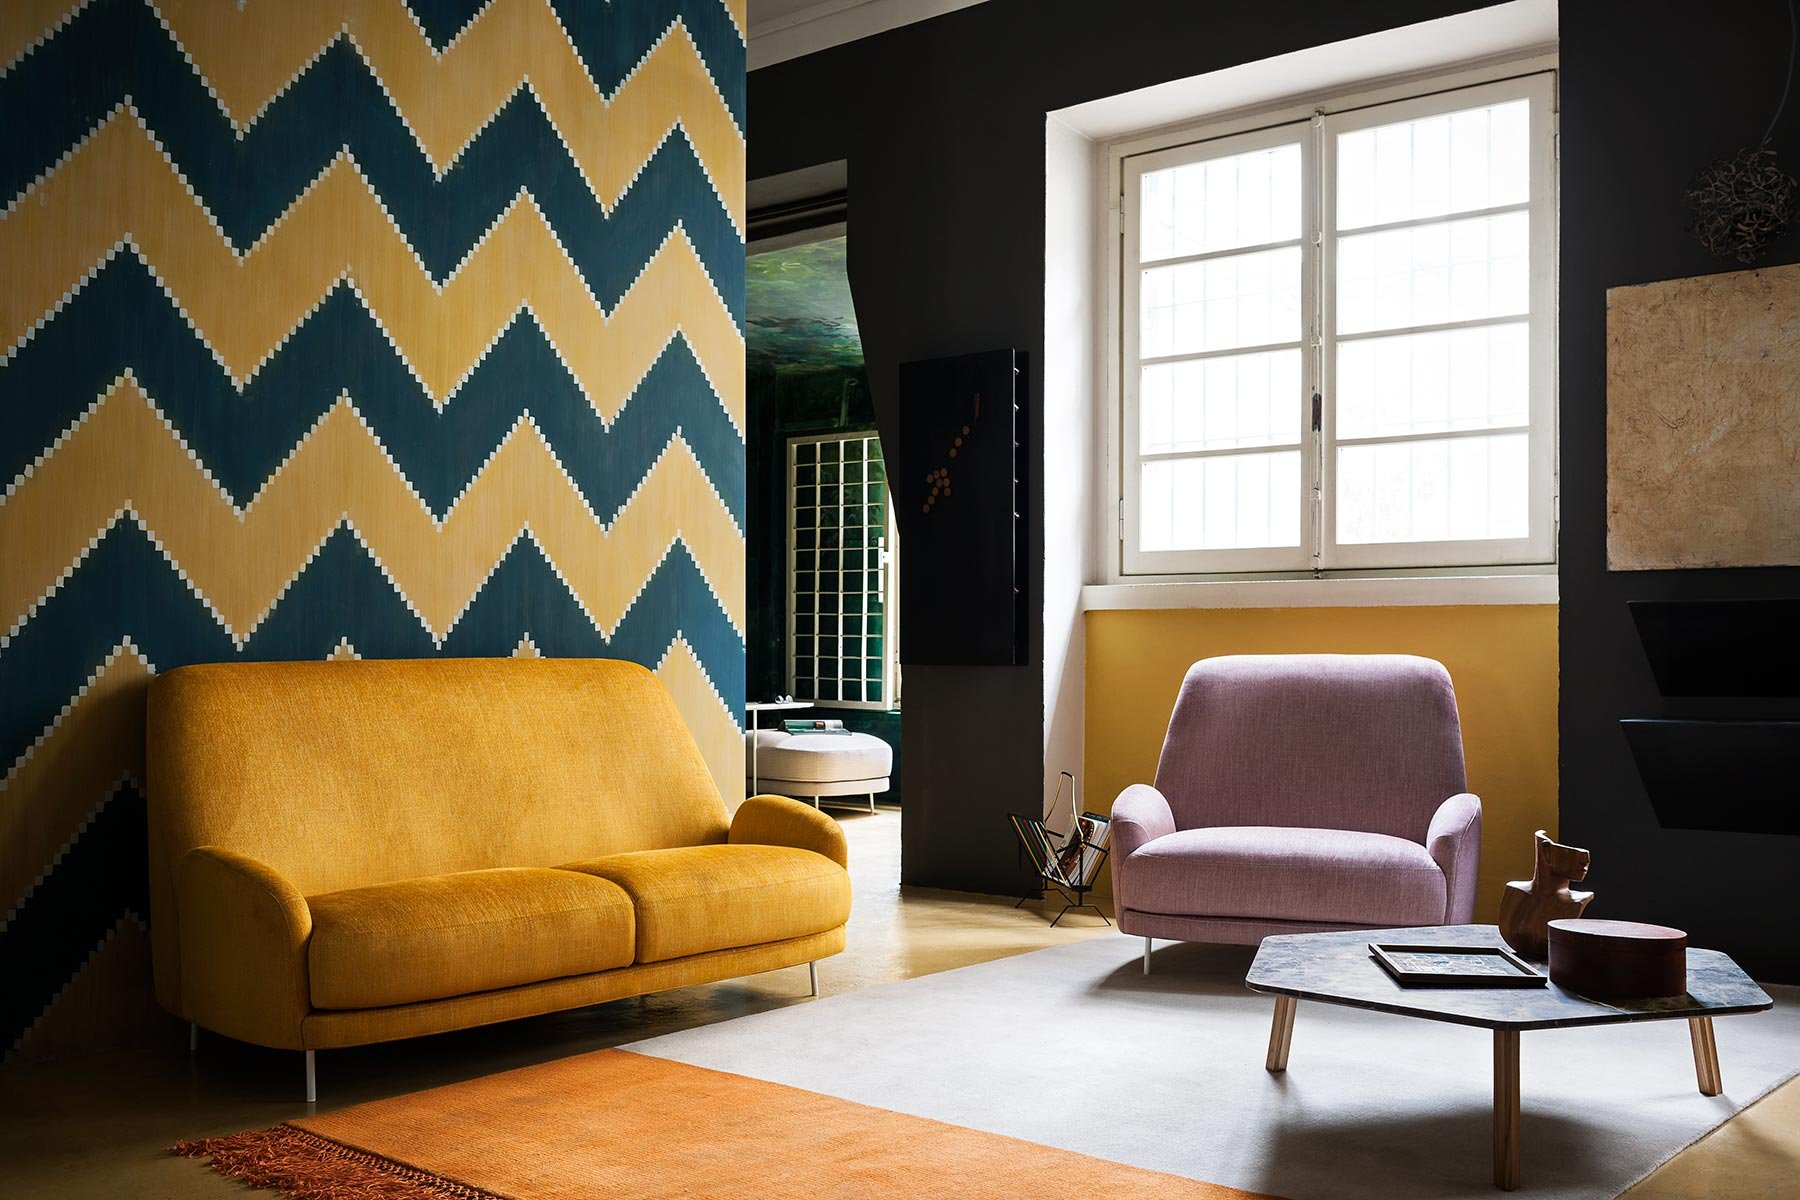 Santiago Armchair lounge from Tacchini, designed by Claesson Koivisto Rune